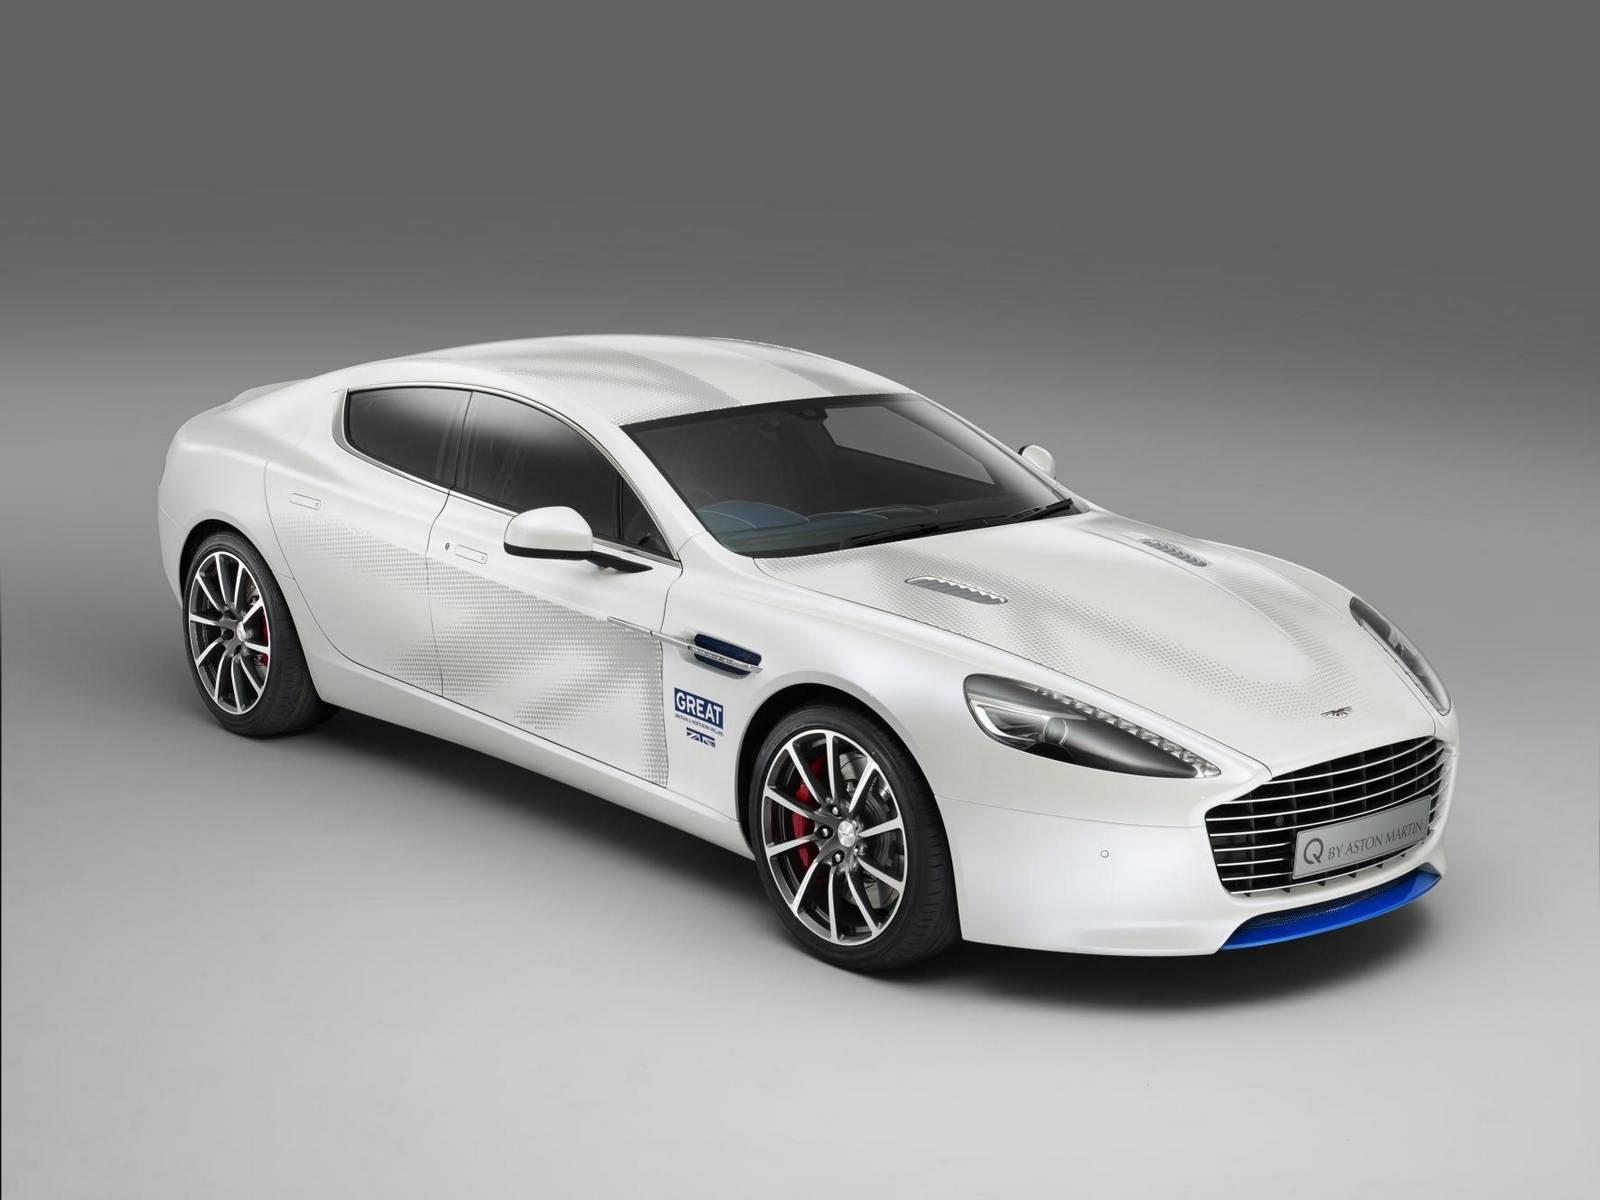 British Themed Q By Aston Martin Rapide S Revealed Gtspirit